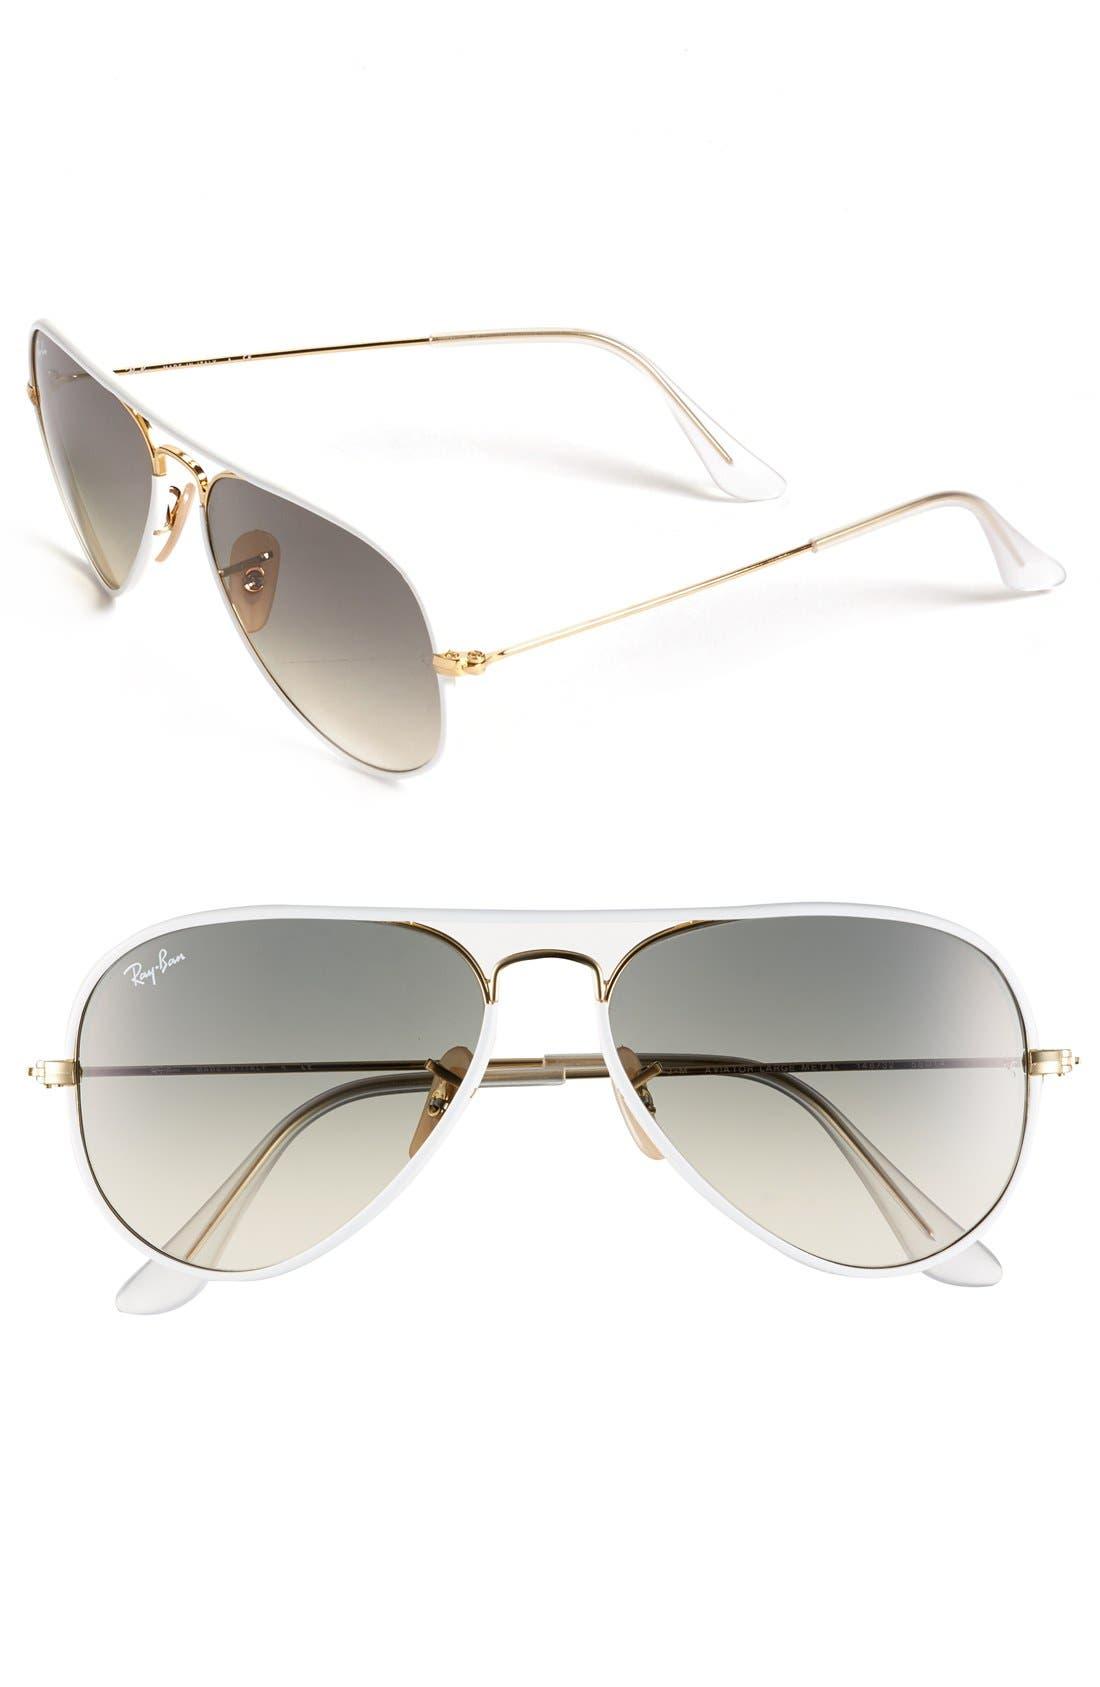 Main Image - Ray-Ban Aviator 58mm Sunglasses